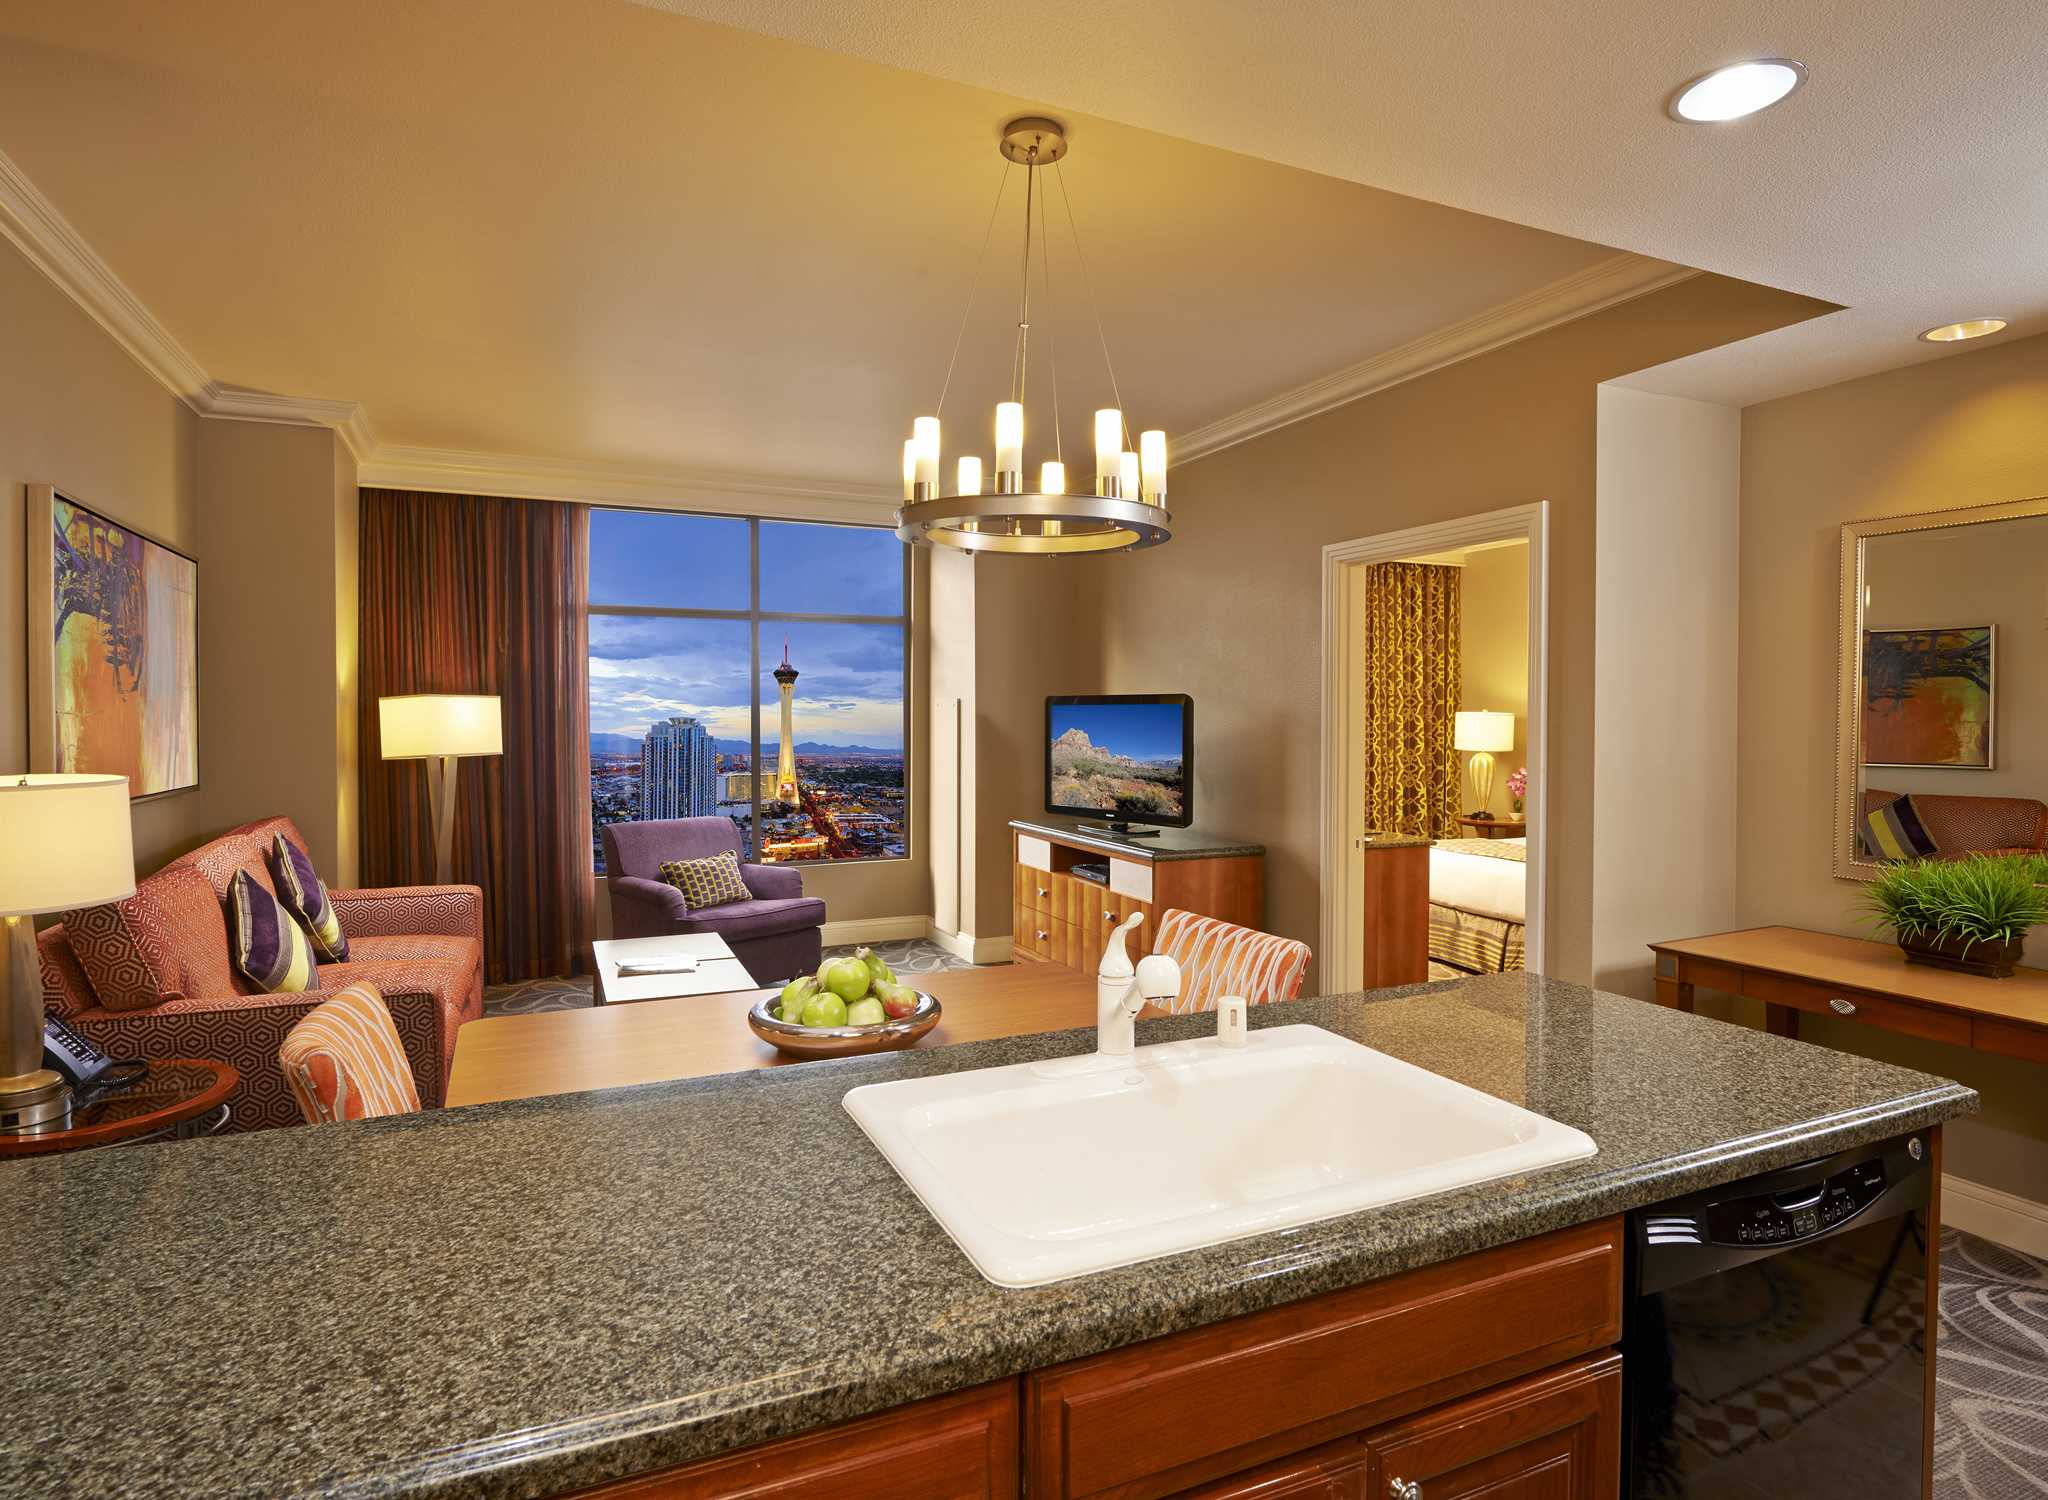 Hotel Hilton Grand Vacations On The Las Vegas Strip Nevada Eua